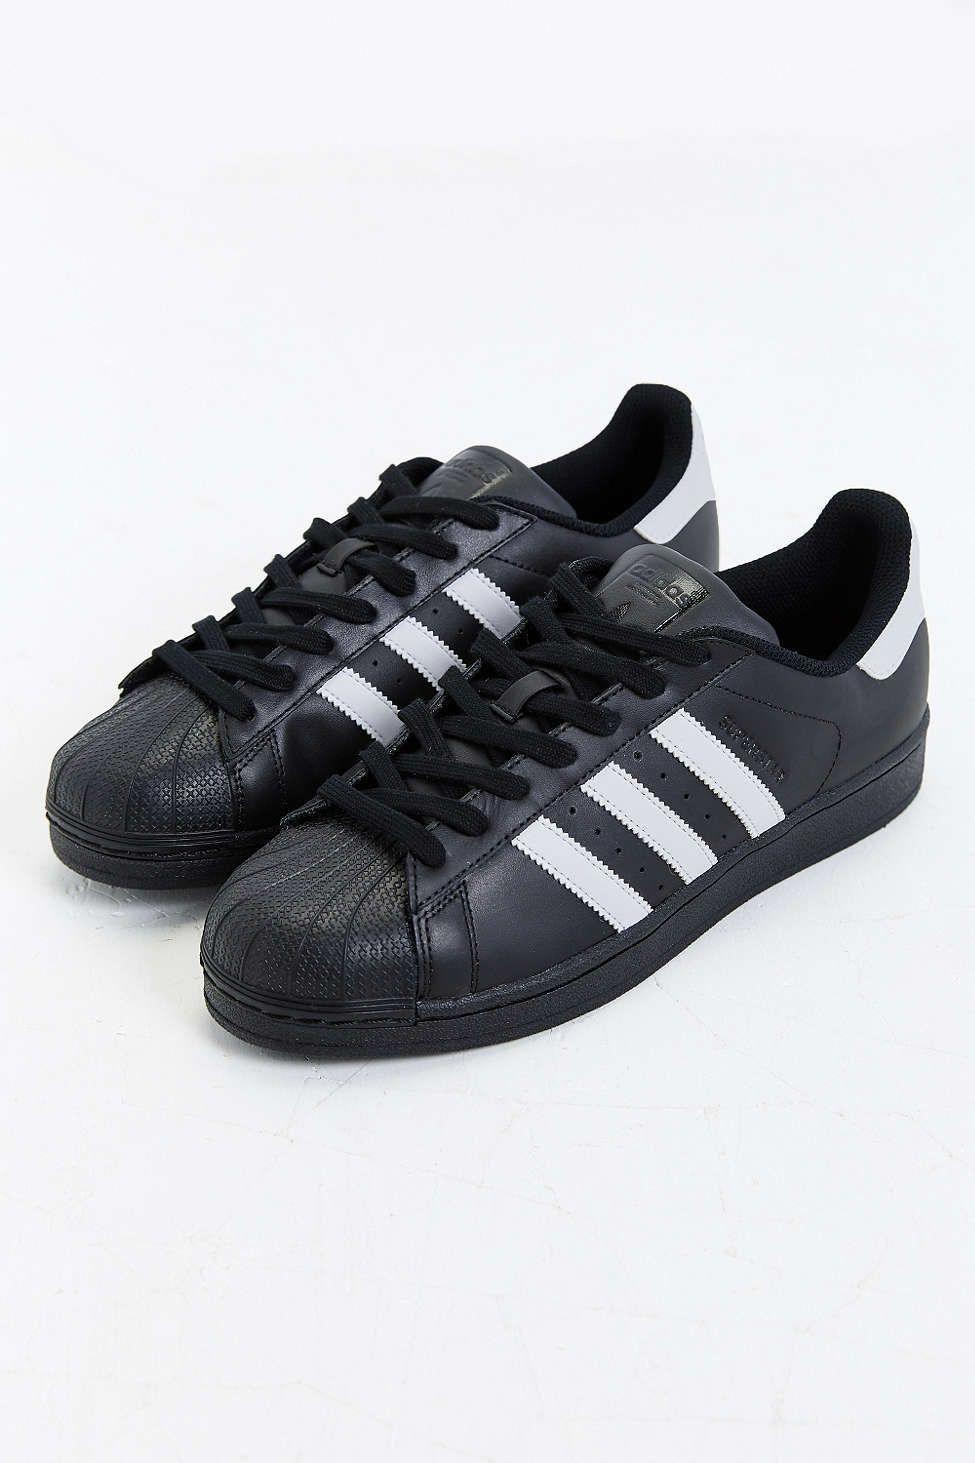 3d0255b9f395 adidas Originals Superstar Foundation Sneaker  MensFashionSneakers ...